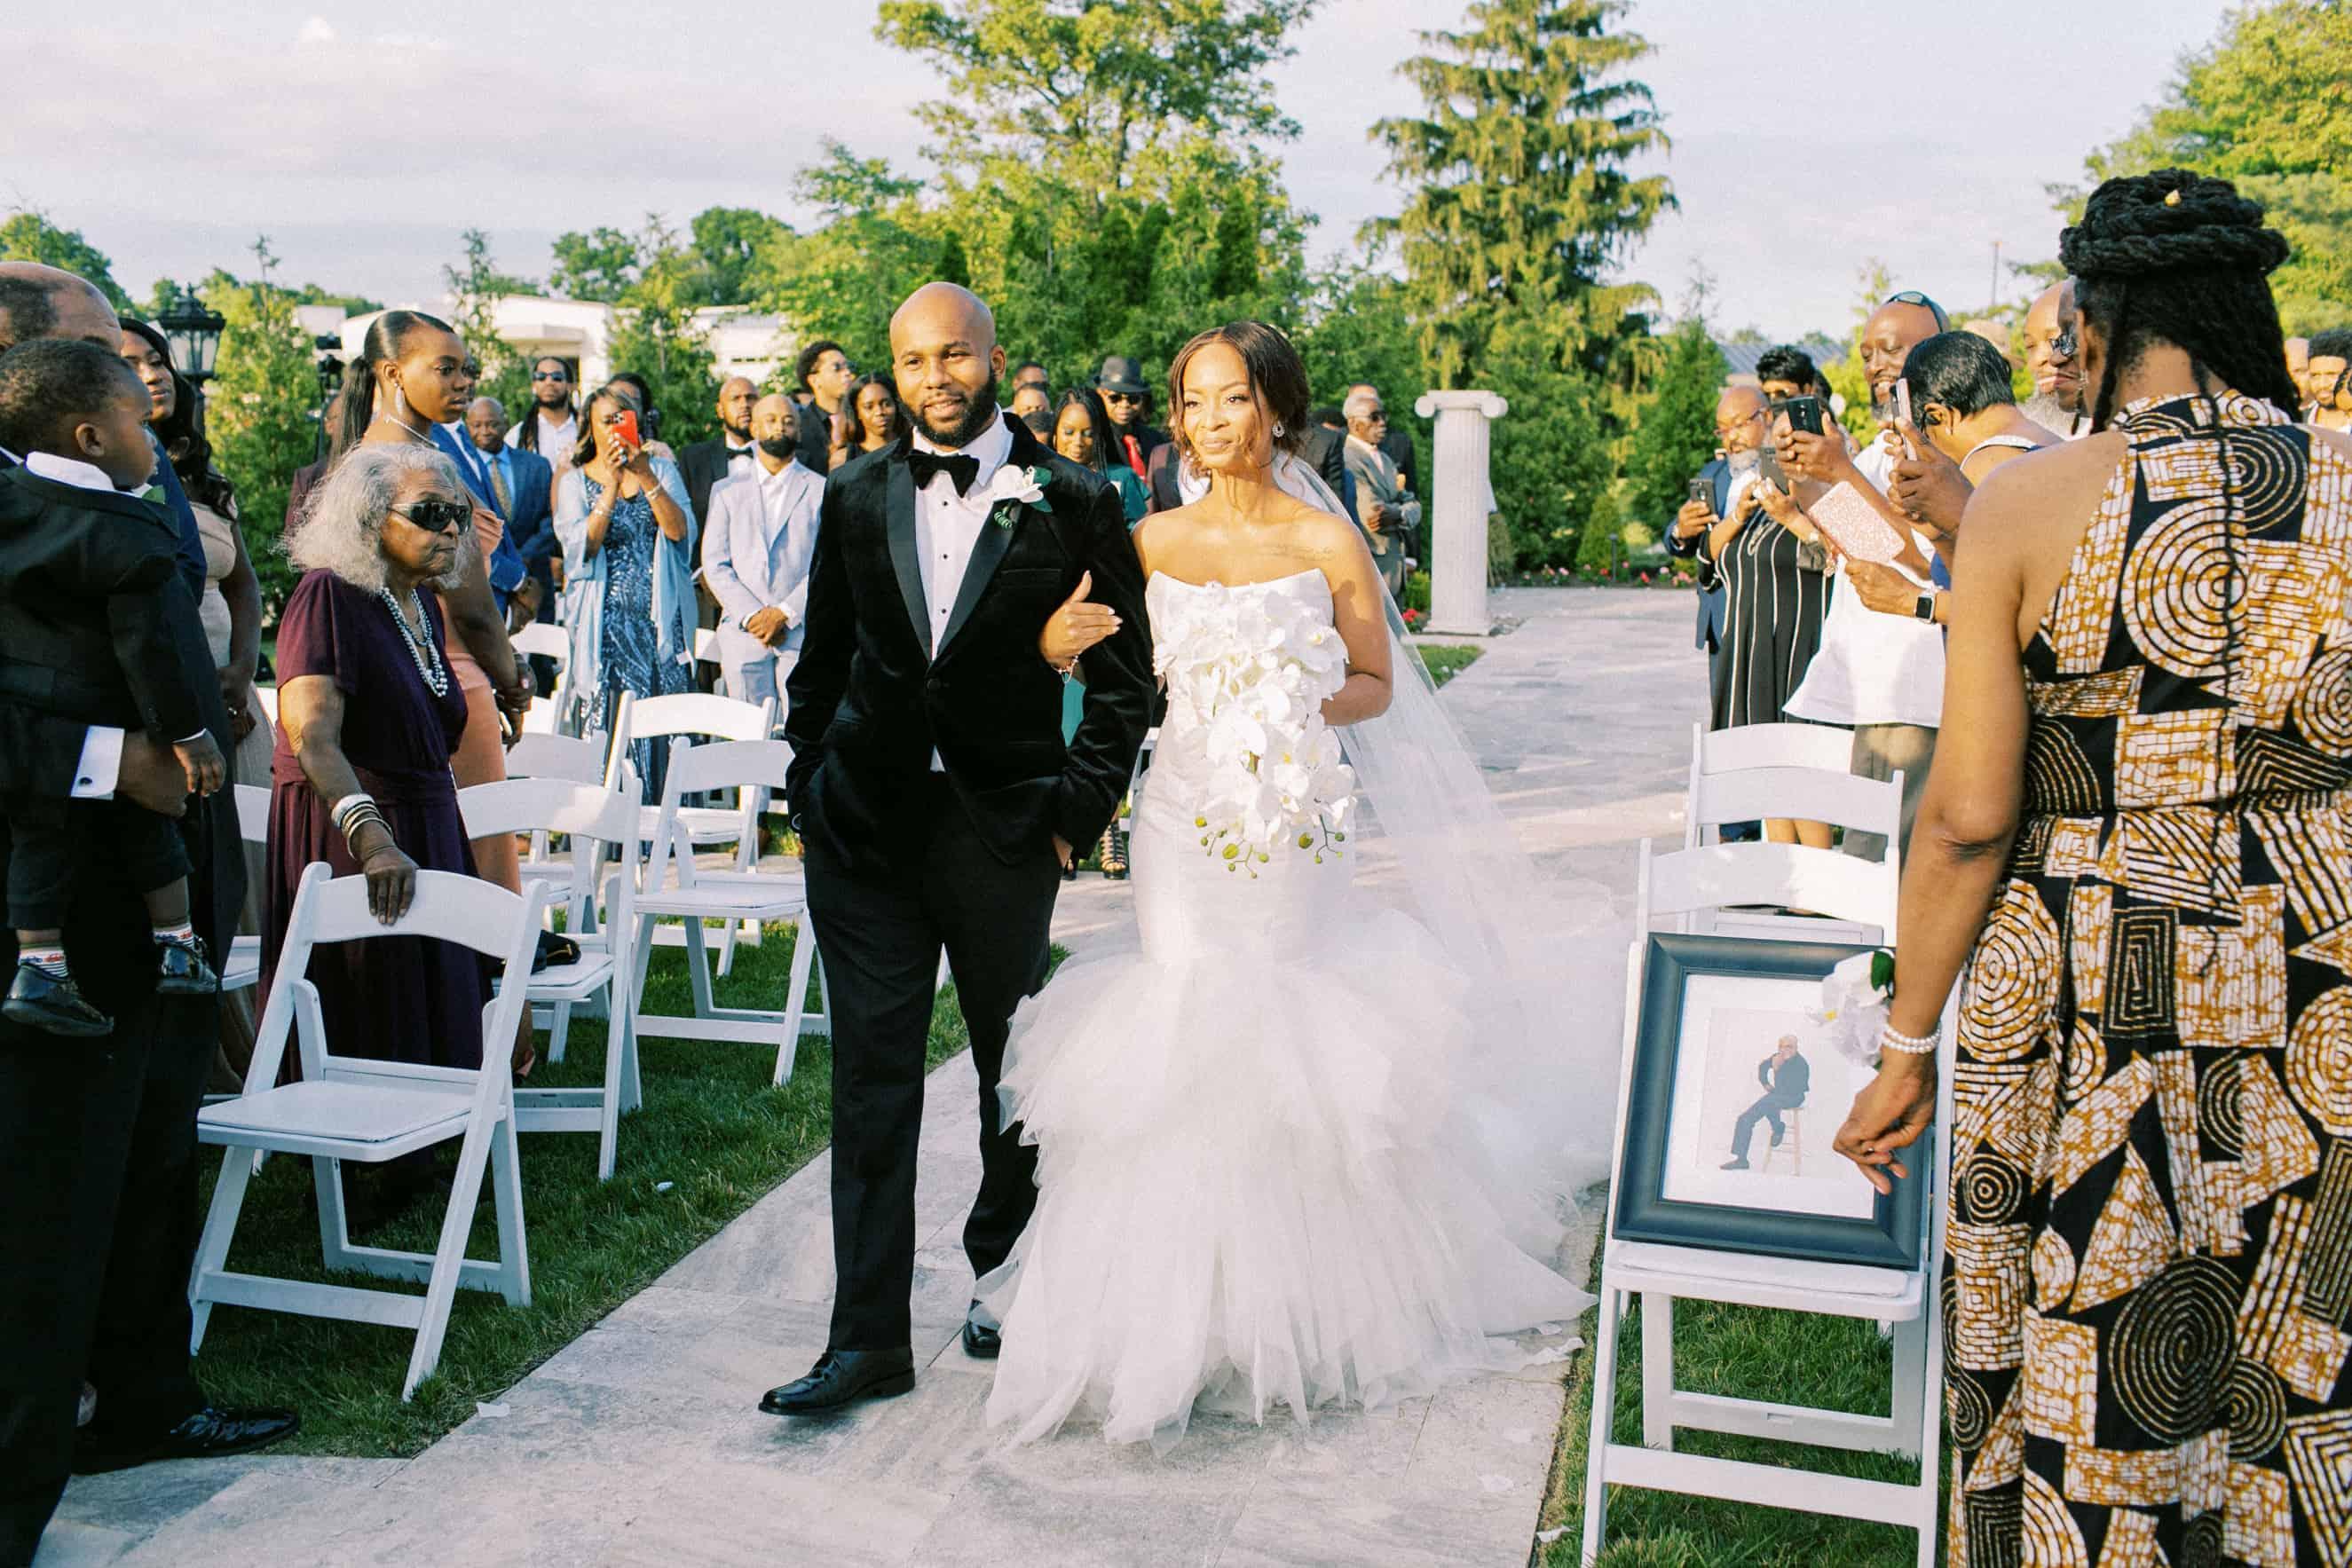 Outdoor Wedding Ceremony Location New Jersey